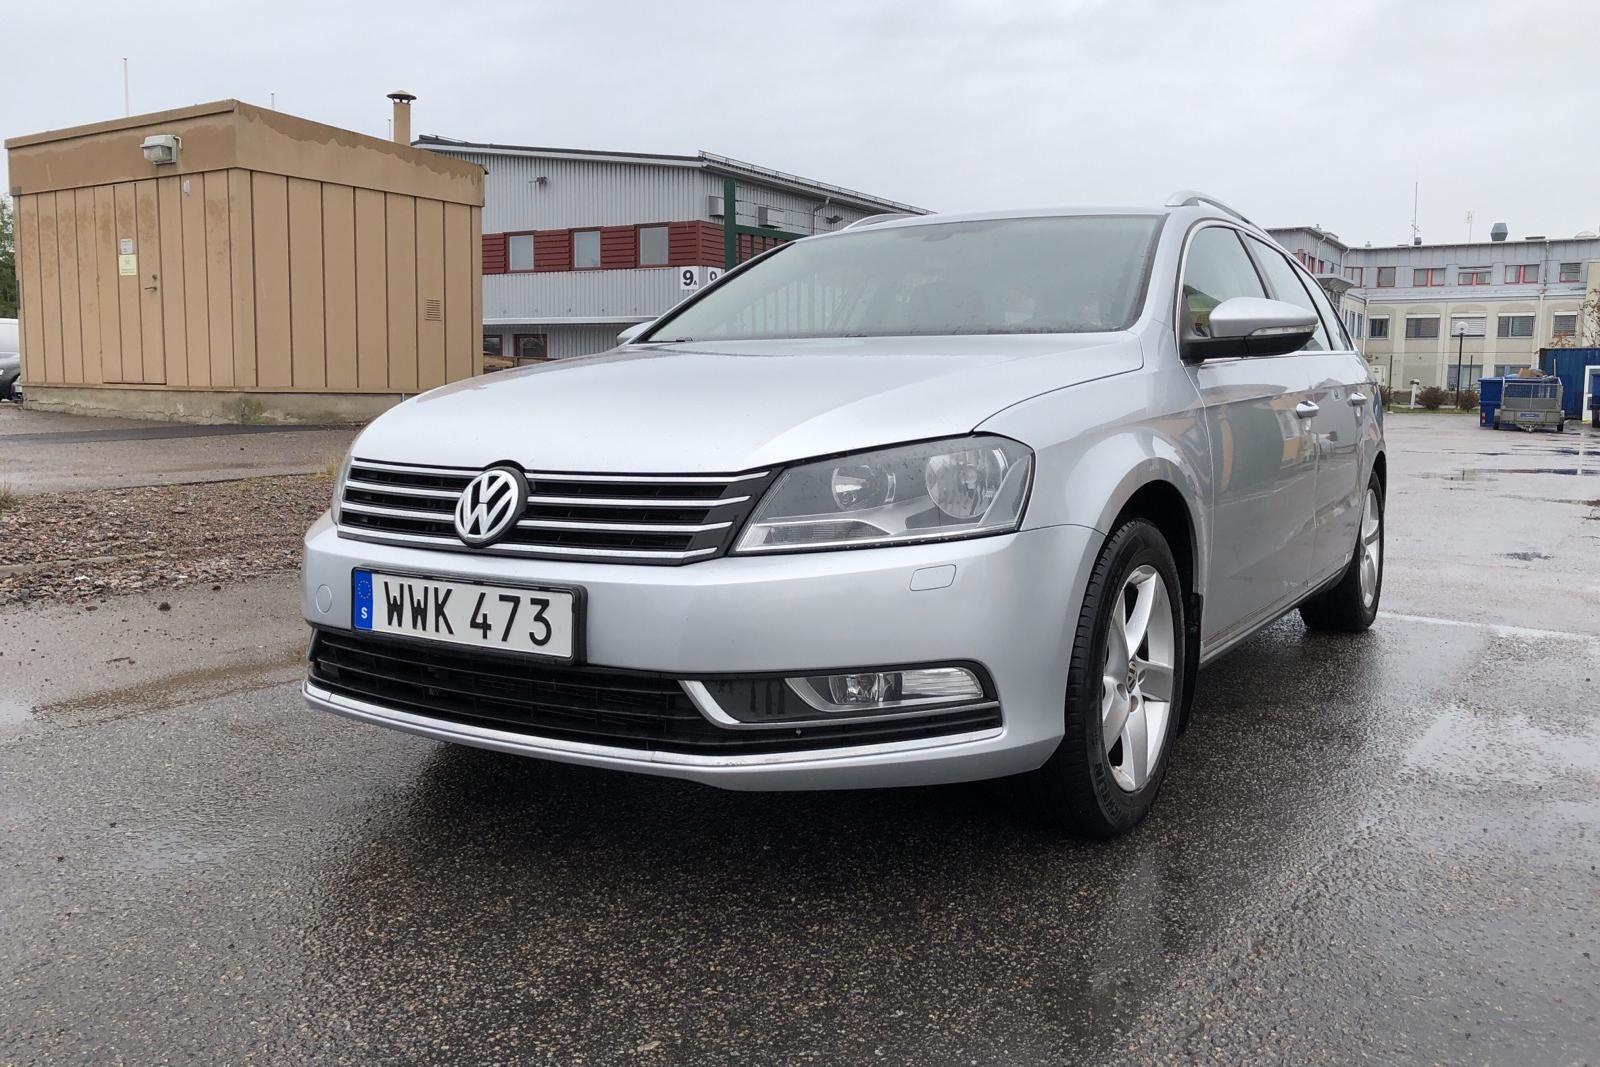 VW Passat 1.4 TSI EcoFuel-Variante (150 hk)